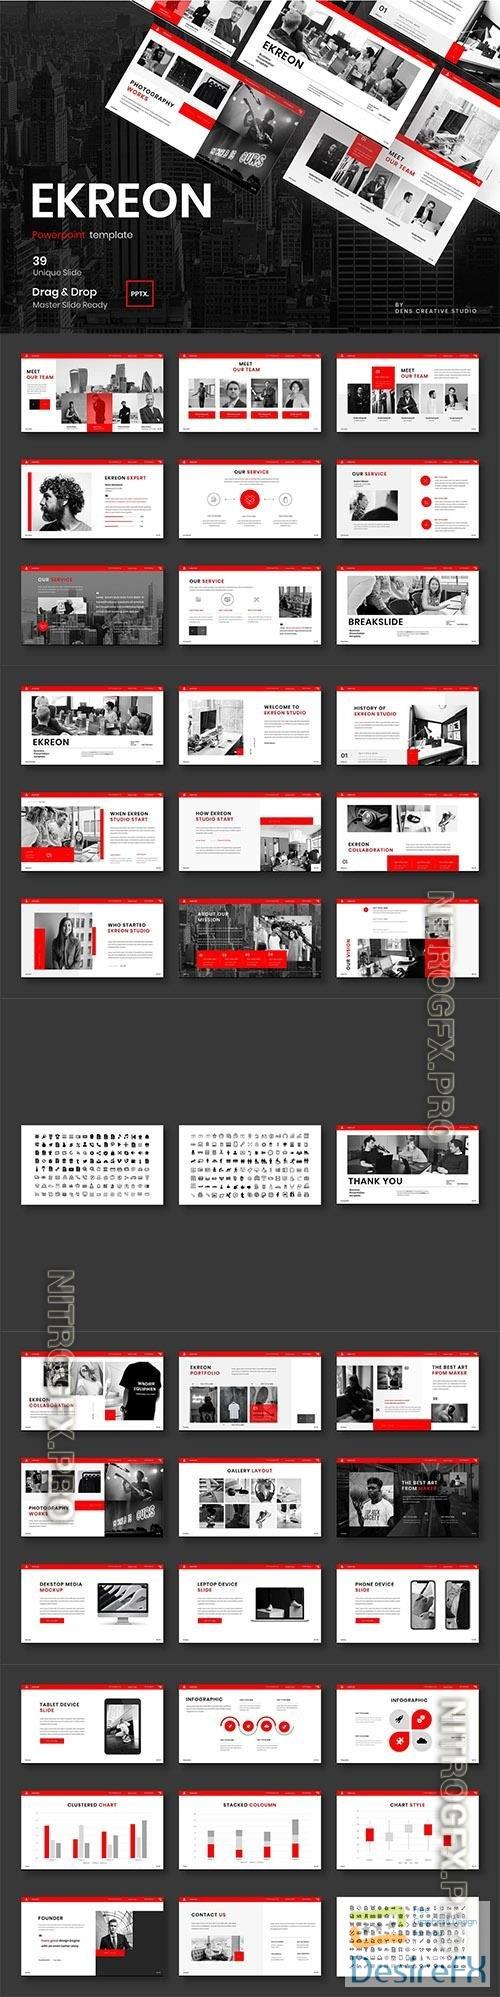 Ekreon – Business Powerpoint, Keynote and Google Slides Template